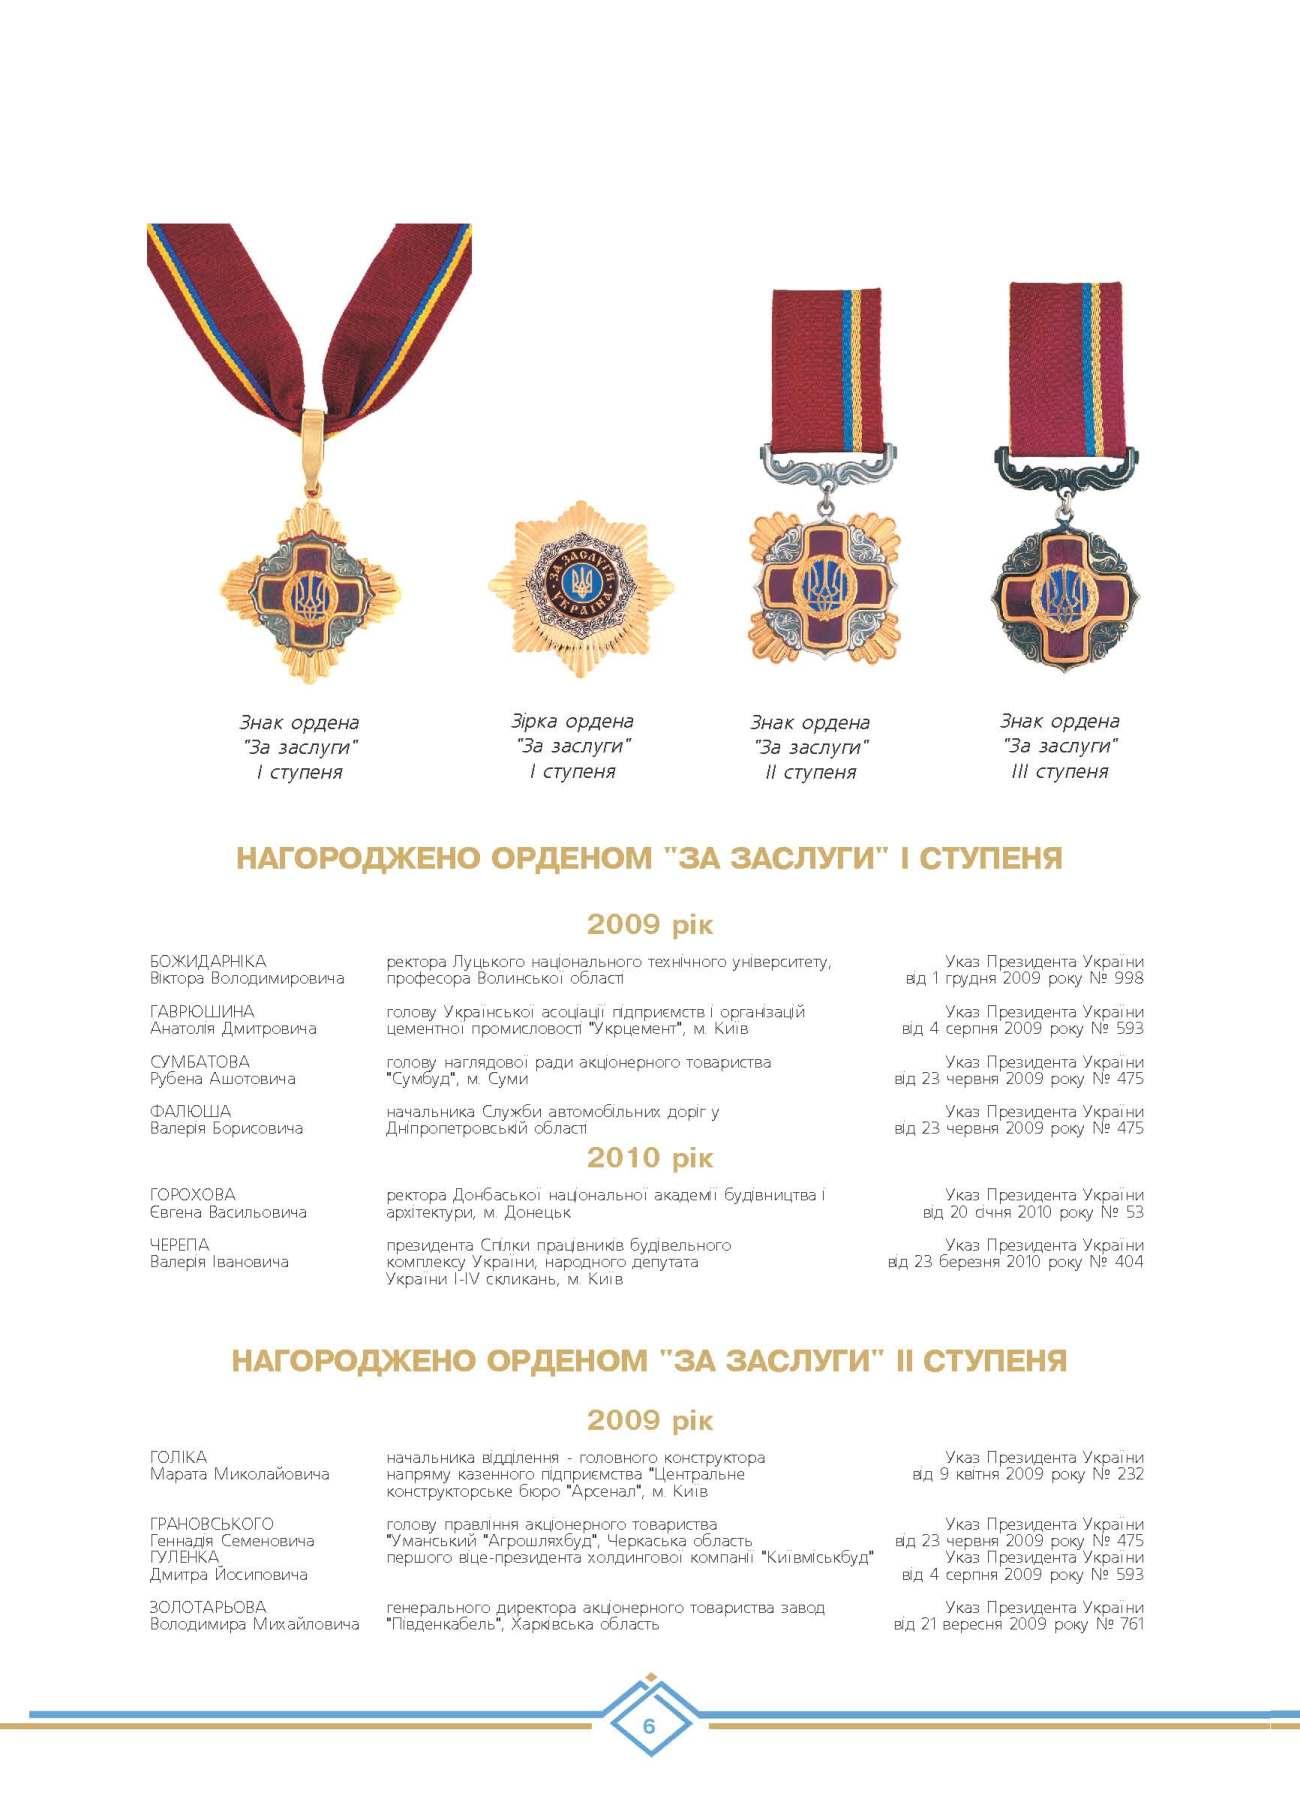 Кавалери ордена